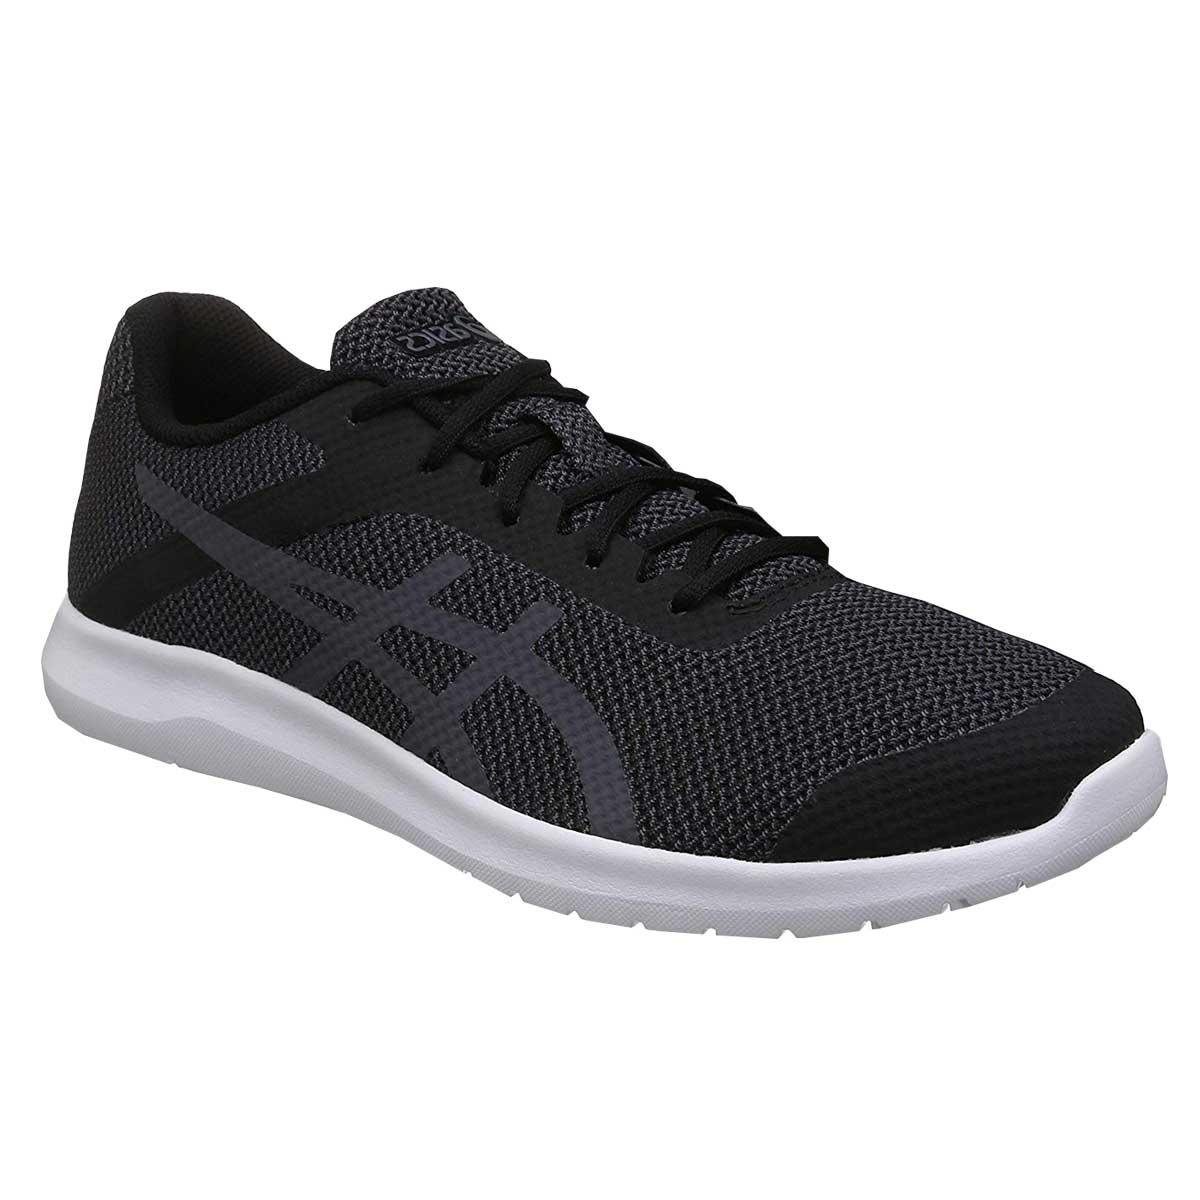 Buy Asics Fuzor 2 Running Shoes (Carbon